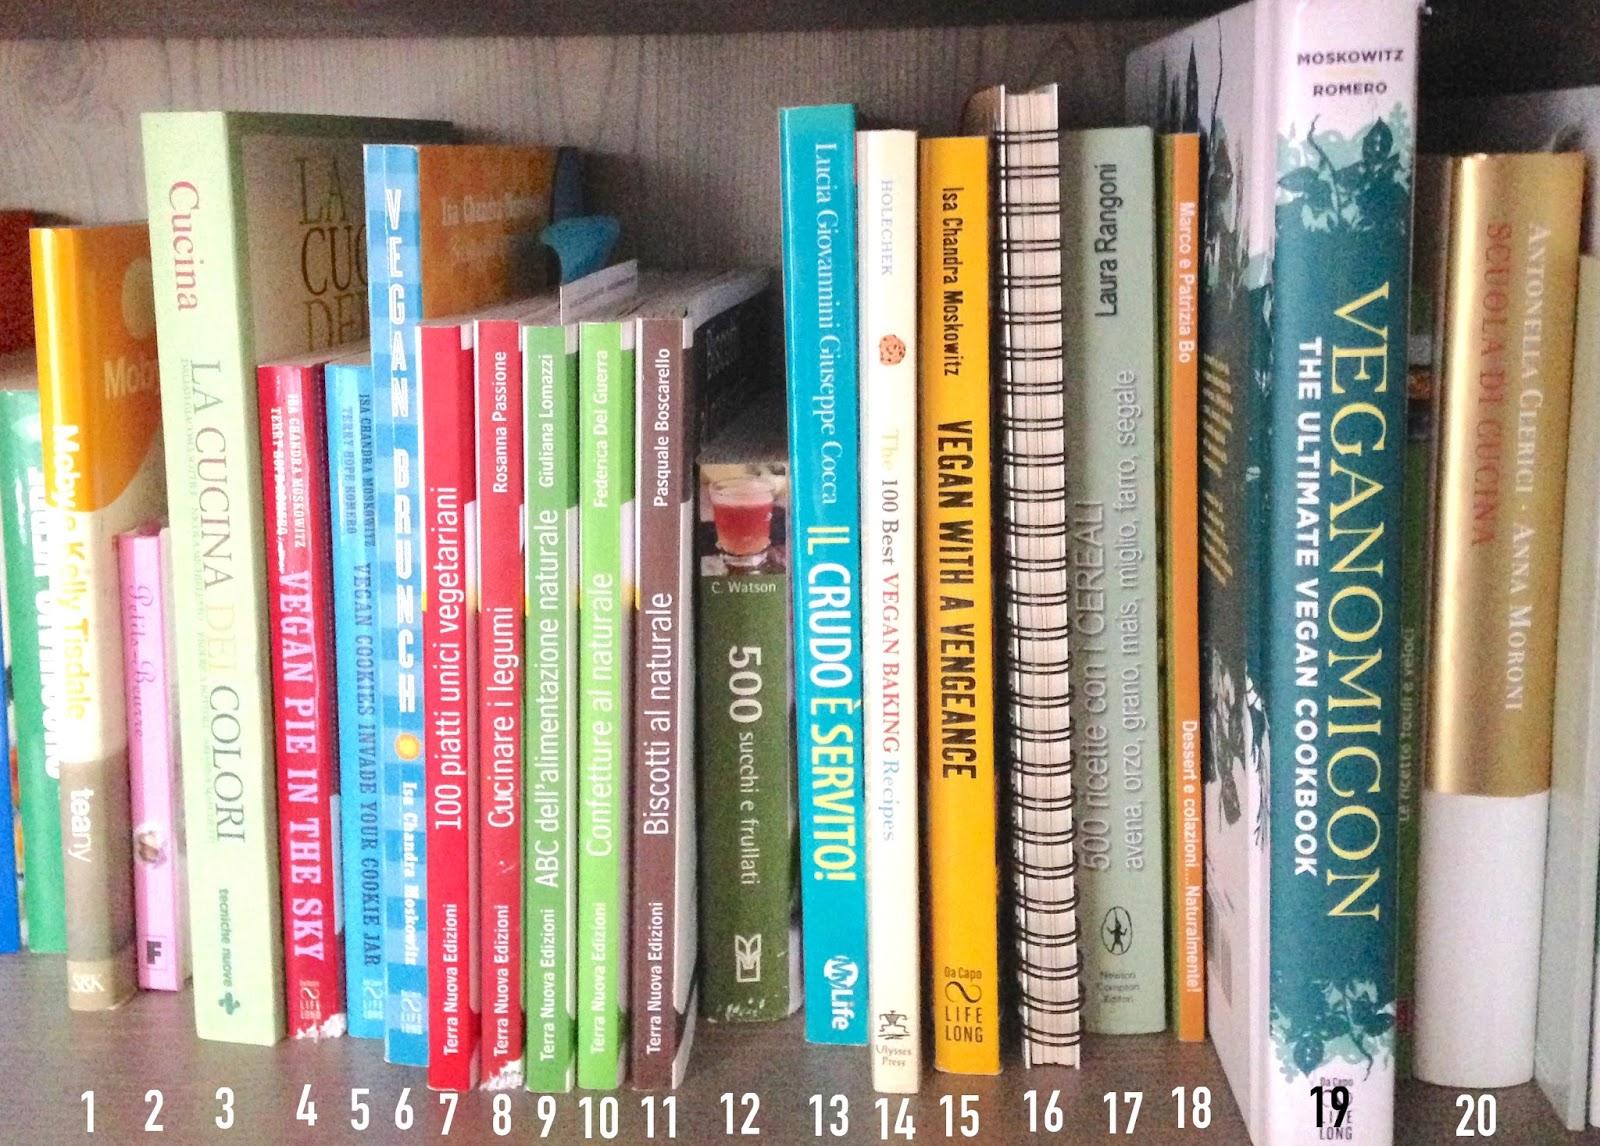 20 libri di cucina veg quali comprare e quali no macrobioticamente - Libri di cucina professionali gratis ...